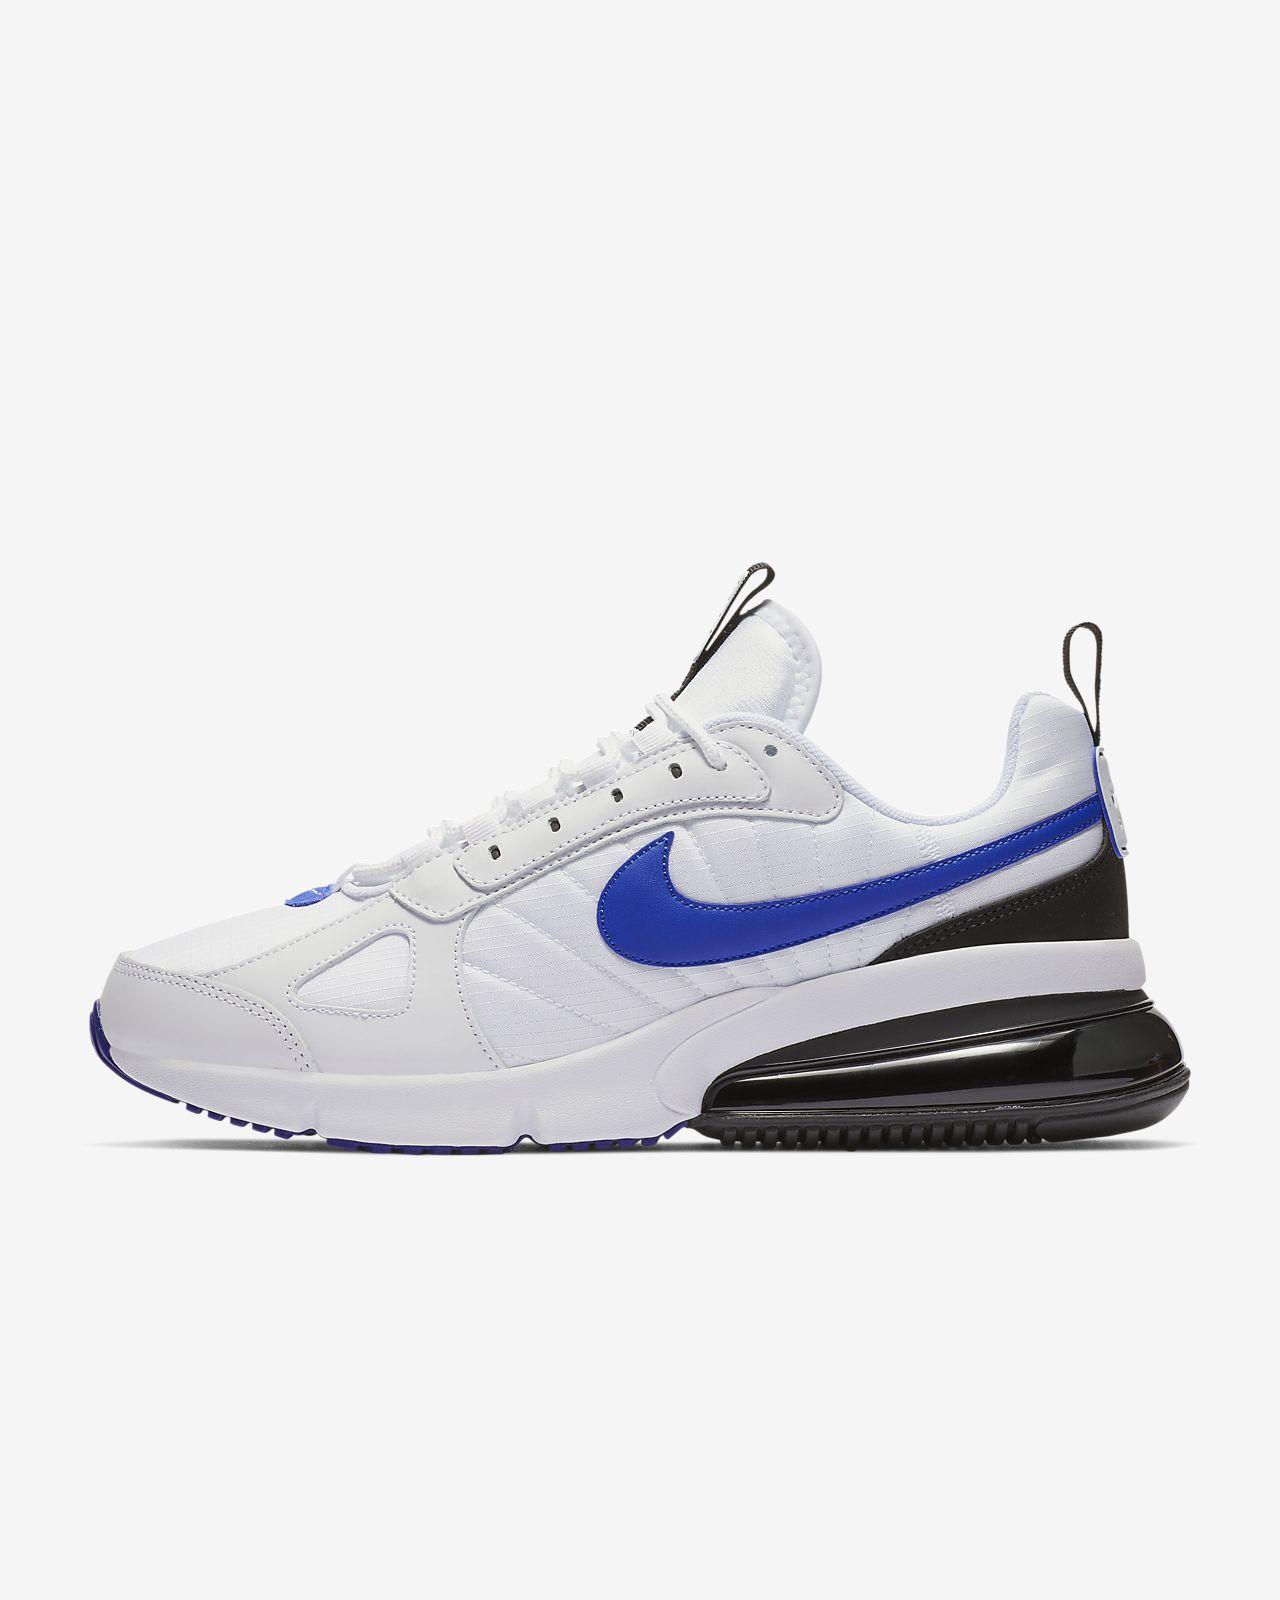 free shipping d8223 54c50 ... Calzado para hombre Nike Air Max 270 Futura